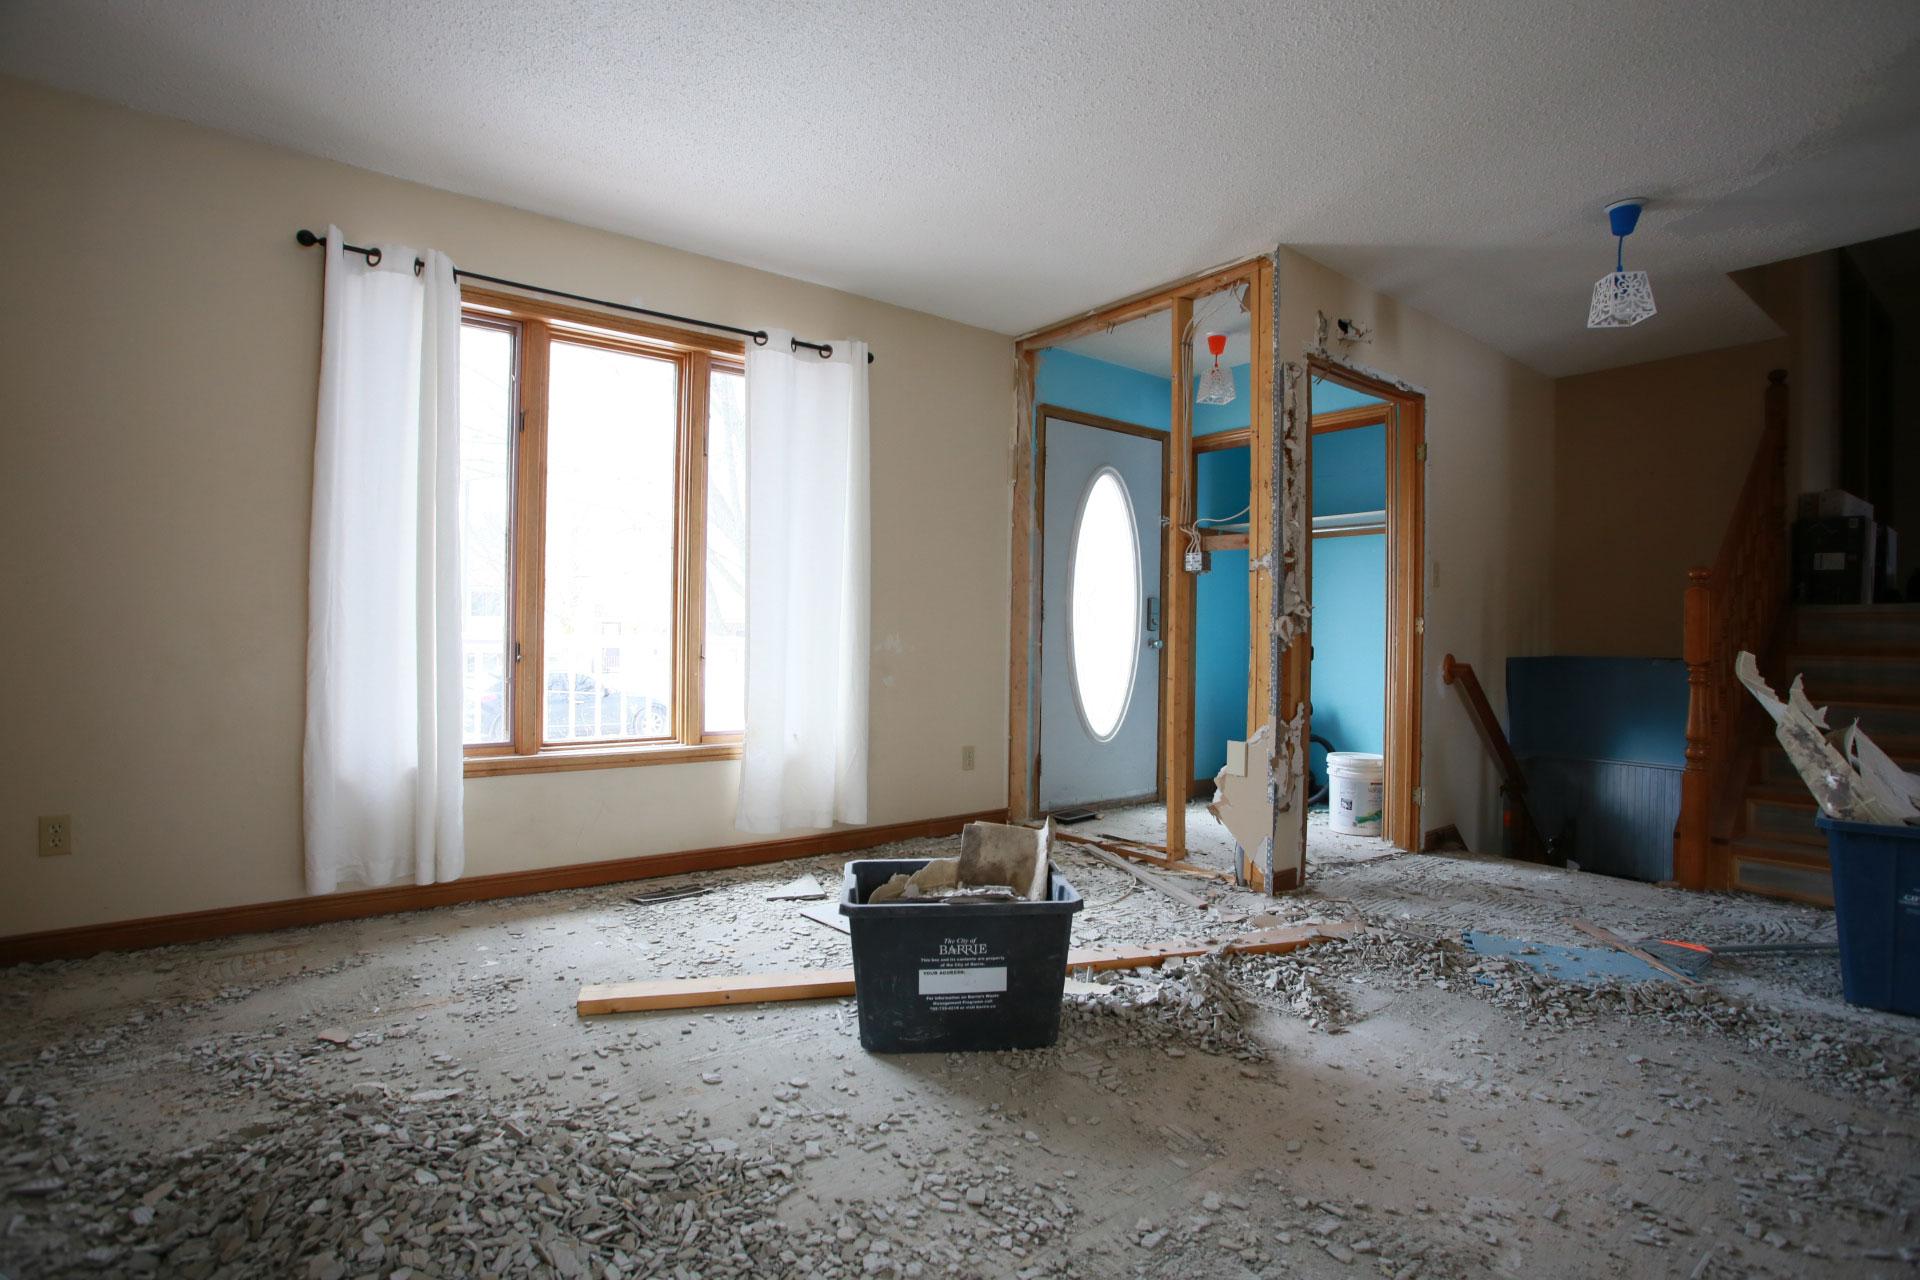 Living Room - Centennial - Before Renovation